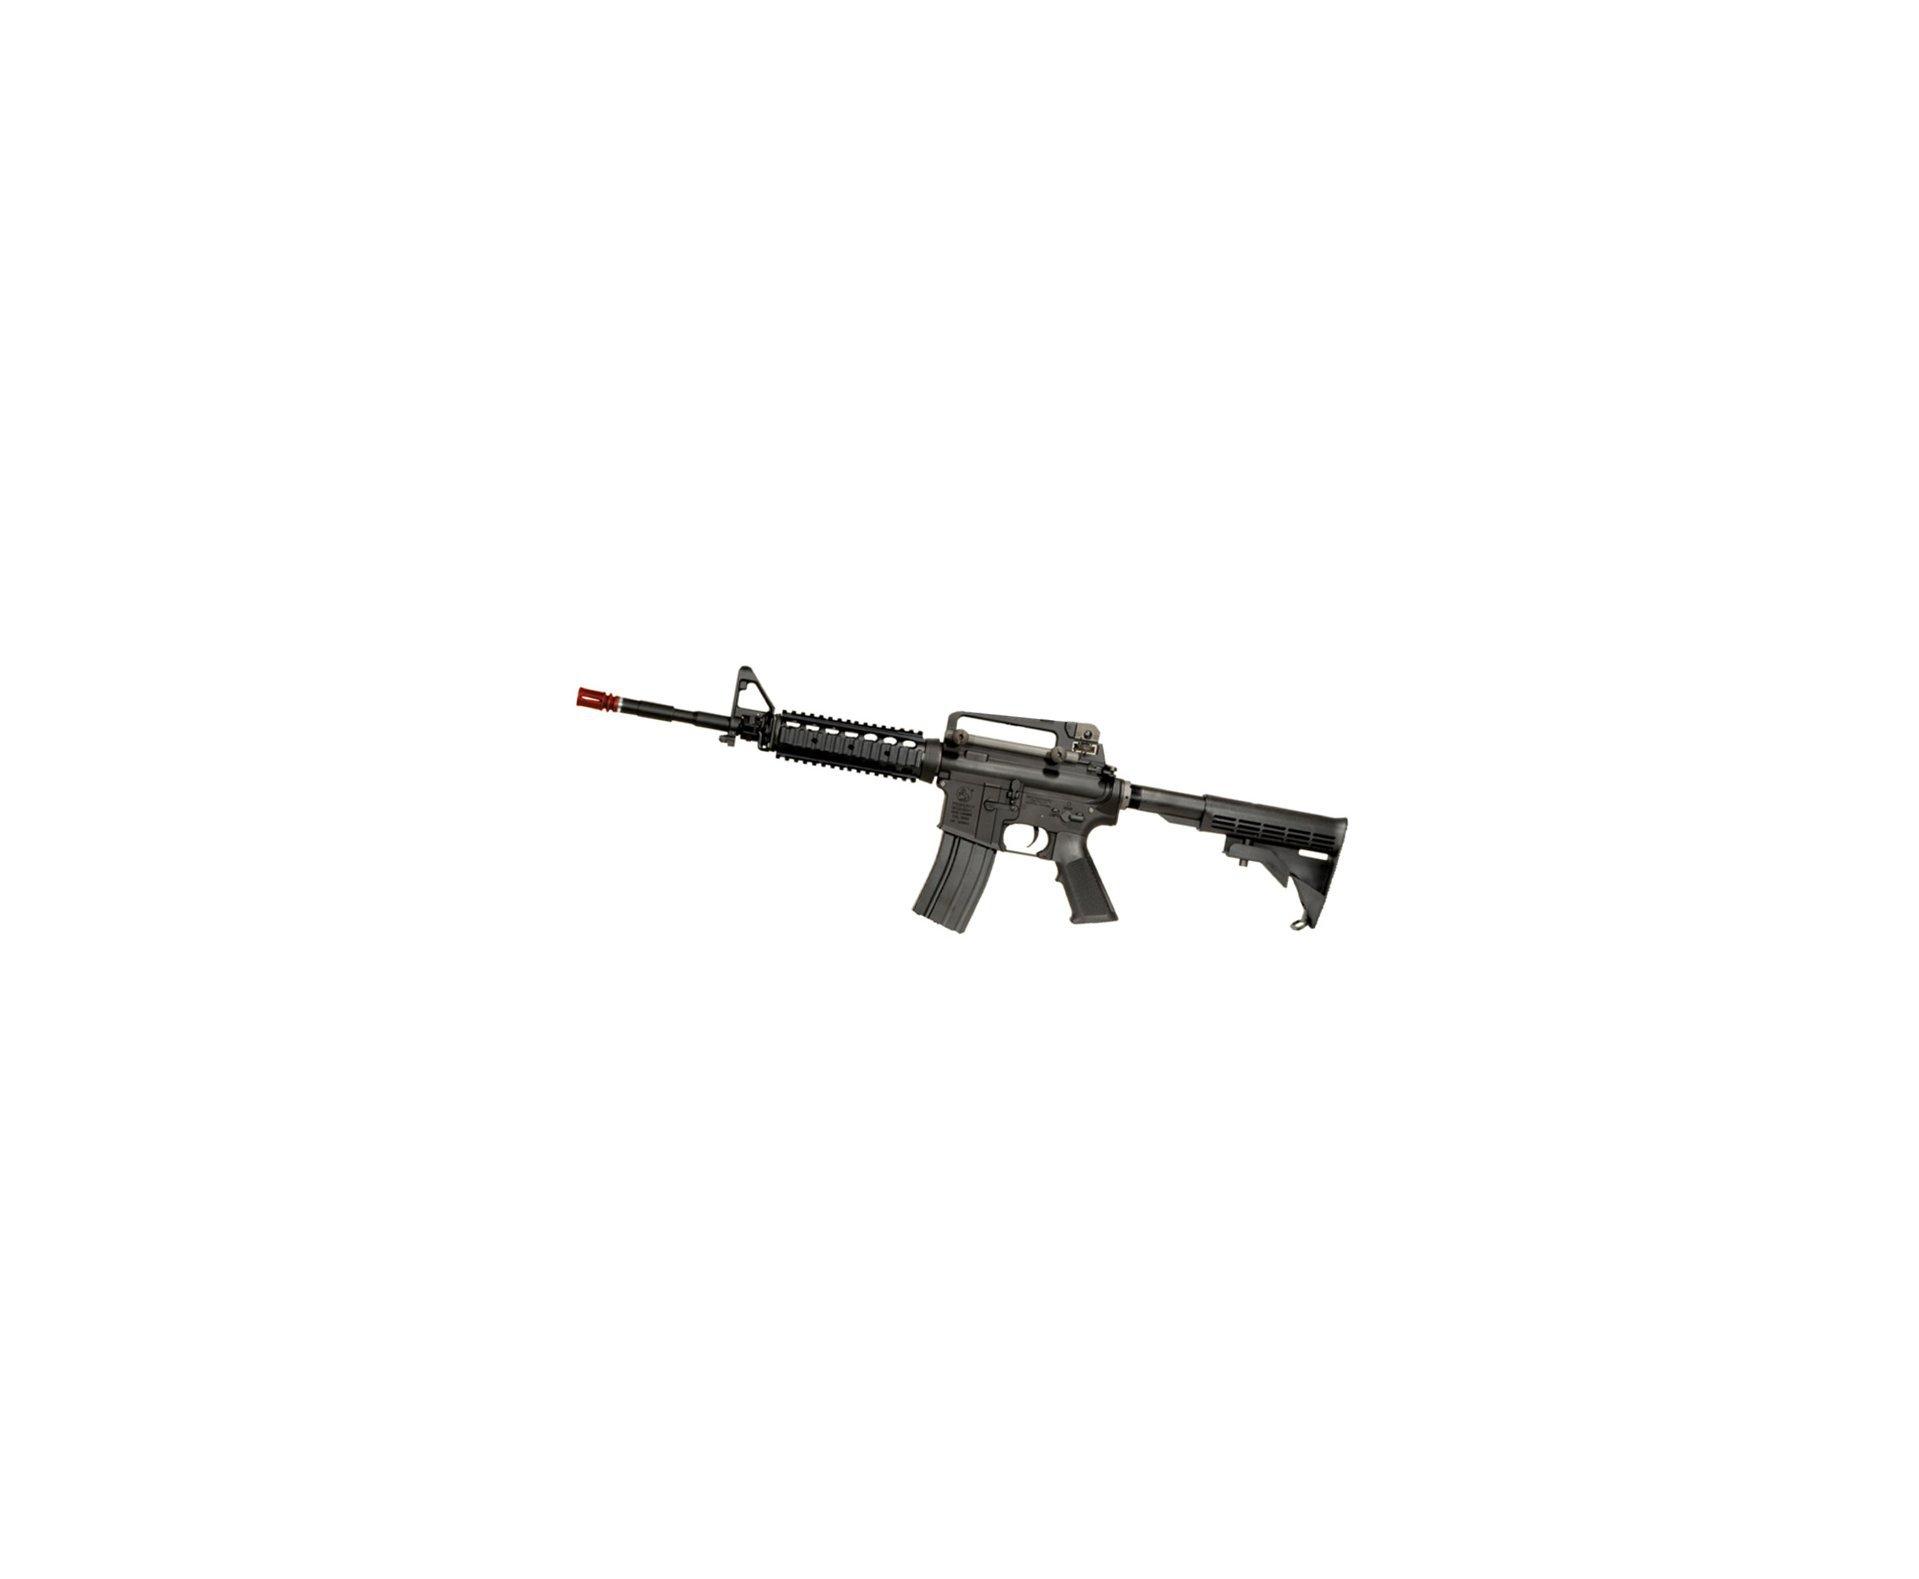 Rifle De Airsoft Colt M4 Ris - Semi Metal - Cal 6,0 Mm -  King Arms